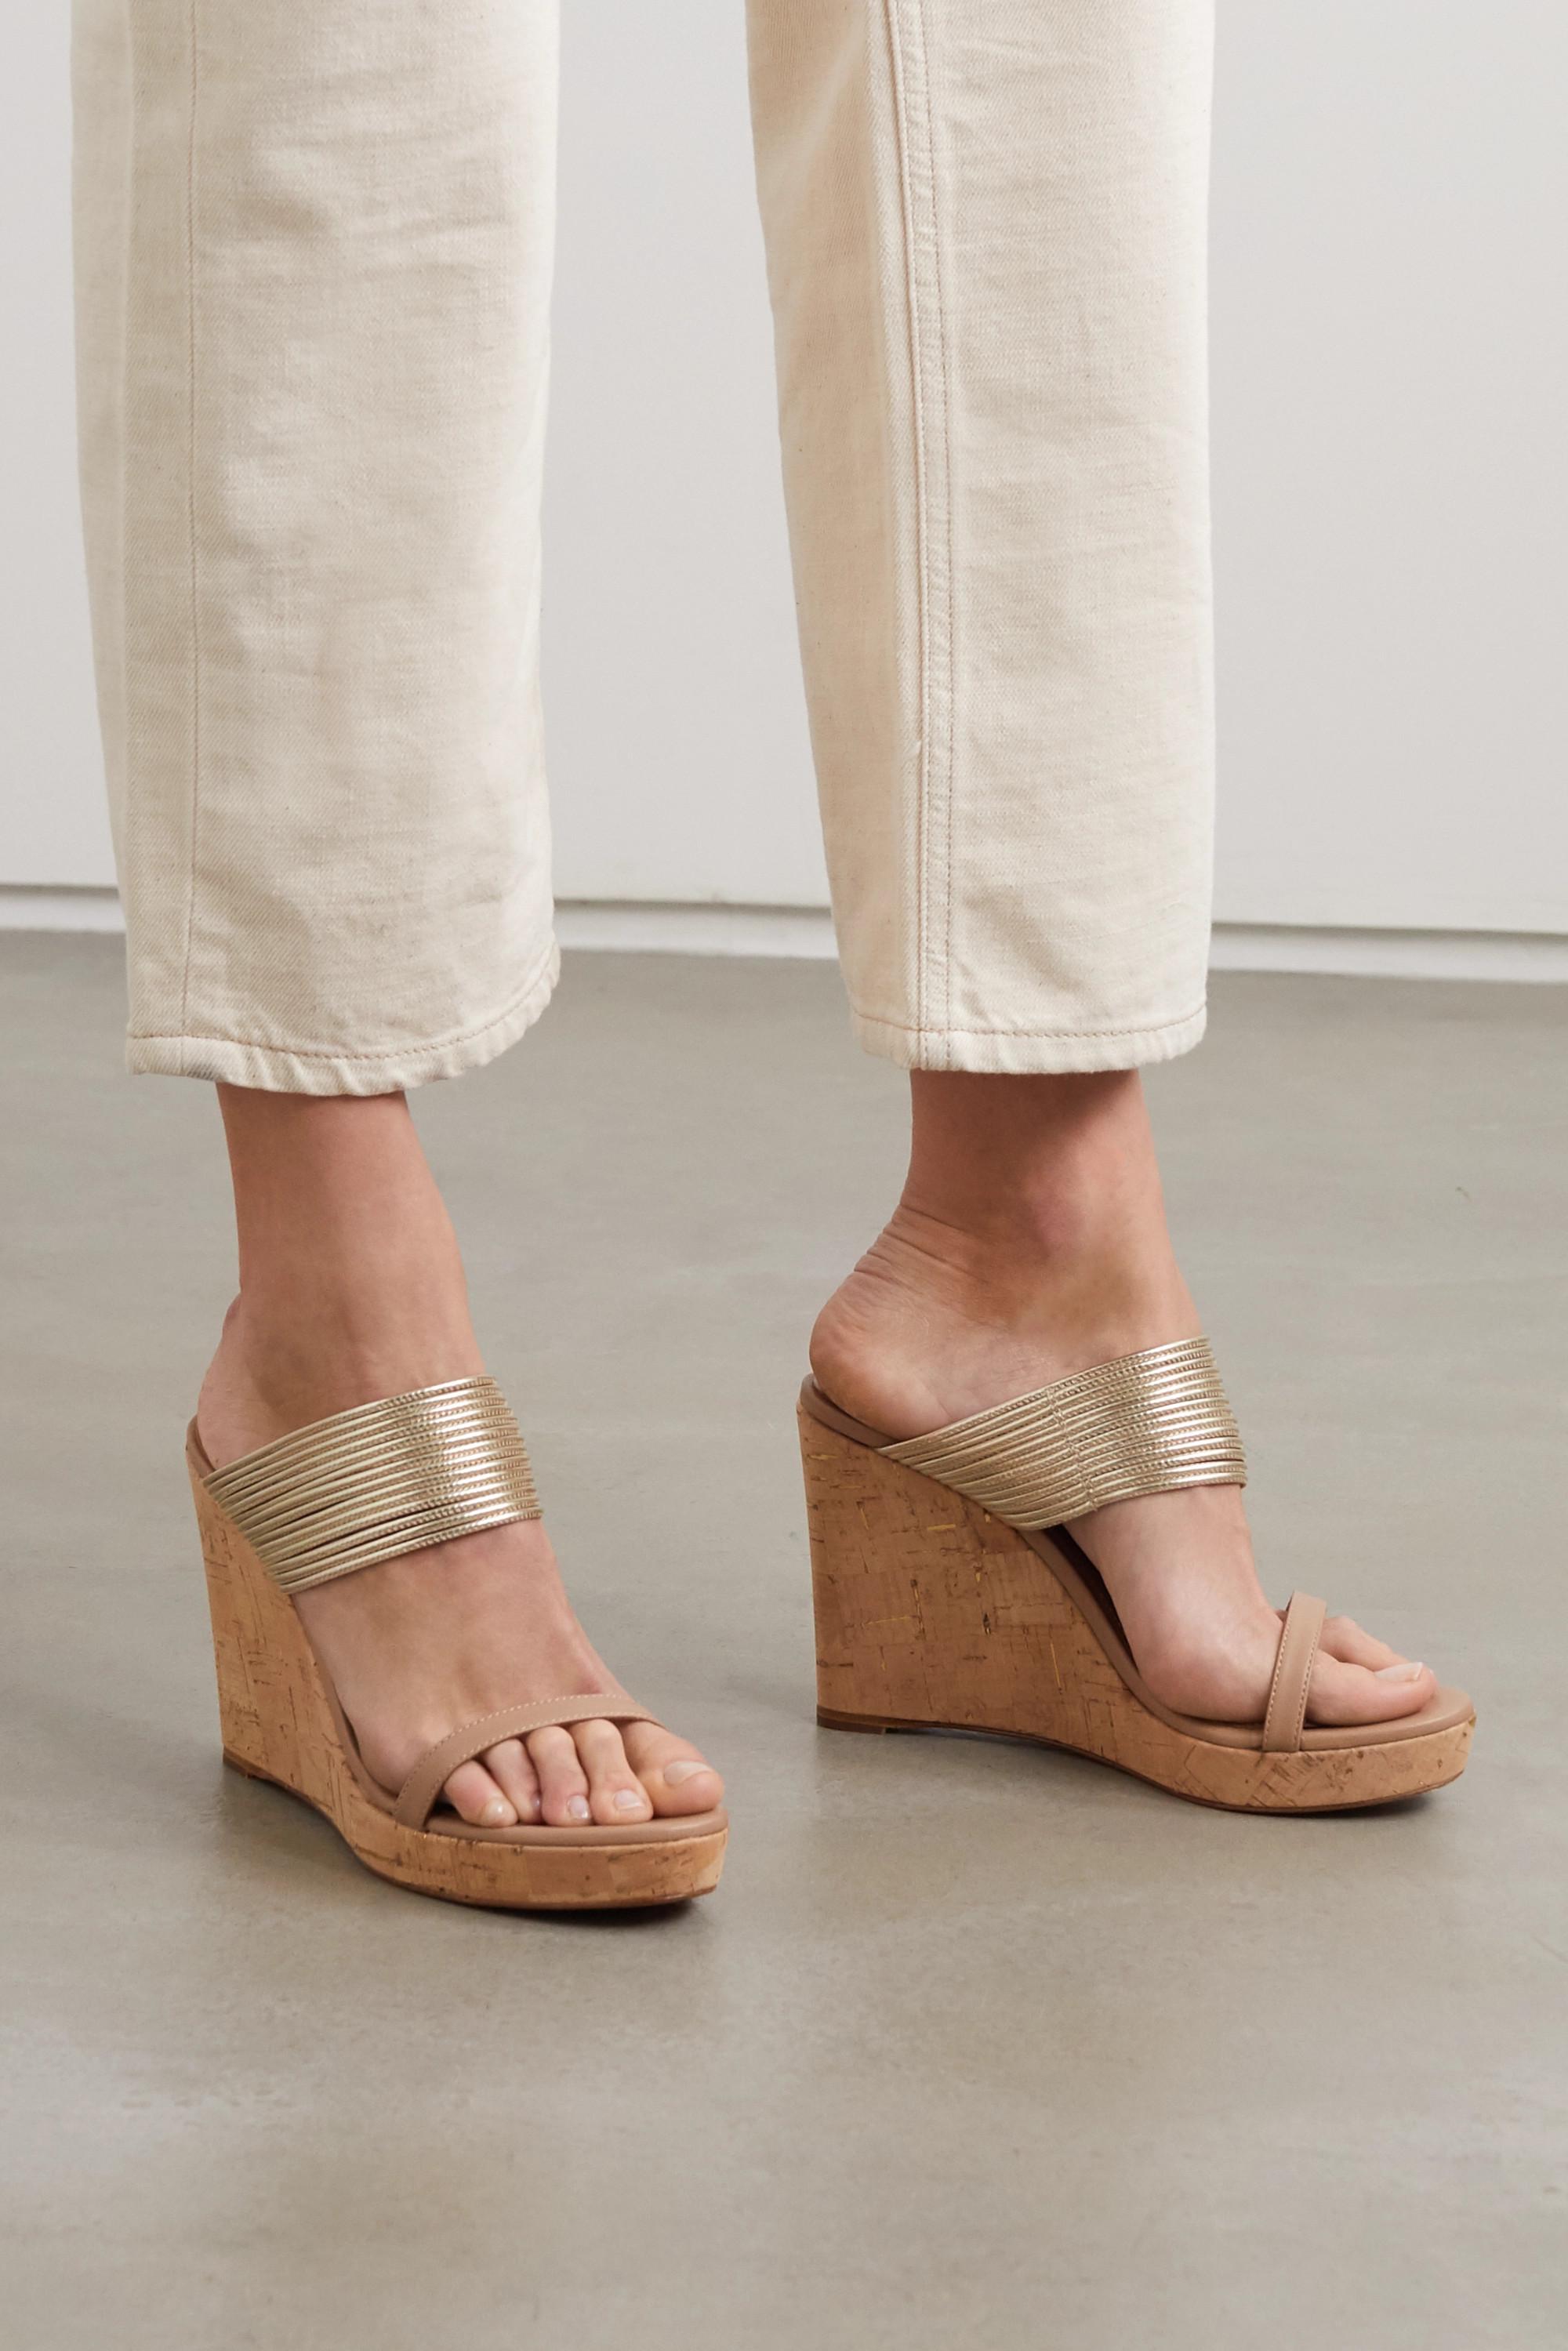 Aquazzura Rendez Vous 105 metallic leather wedge sandals